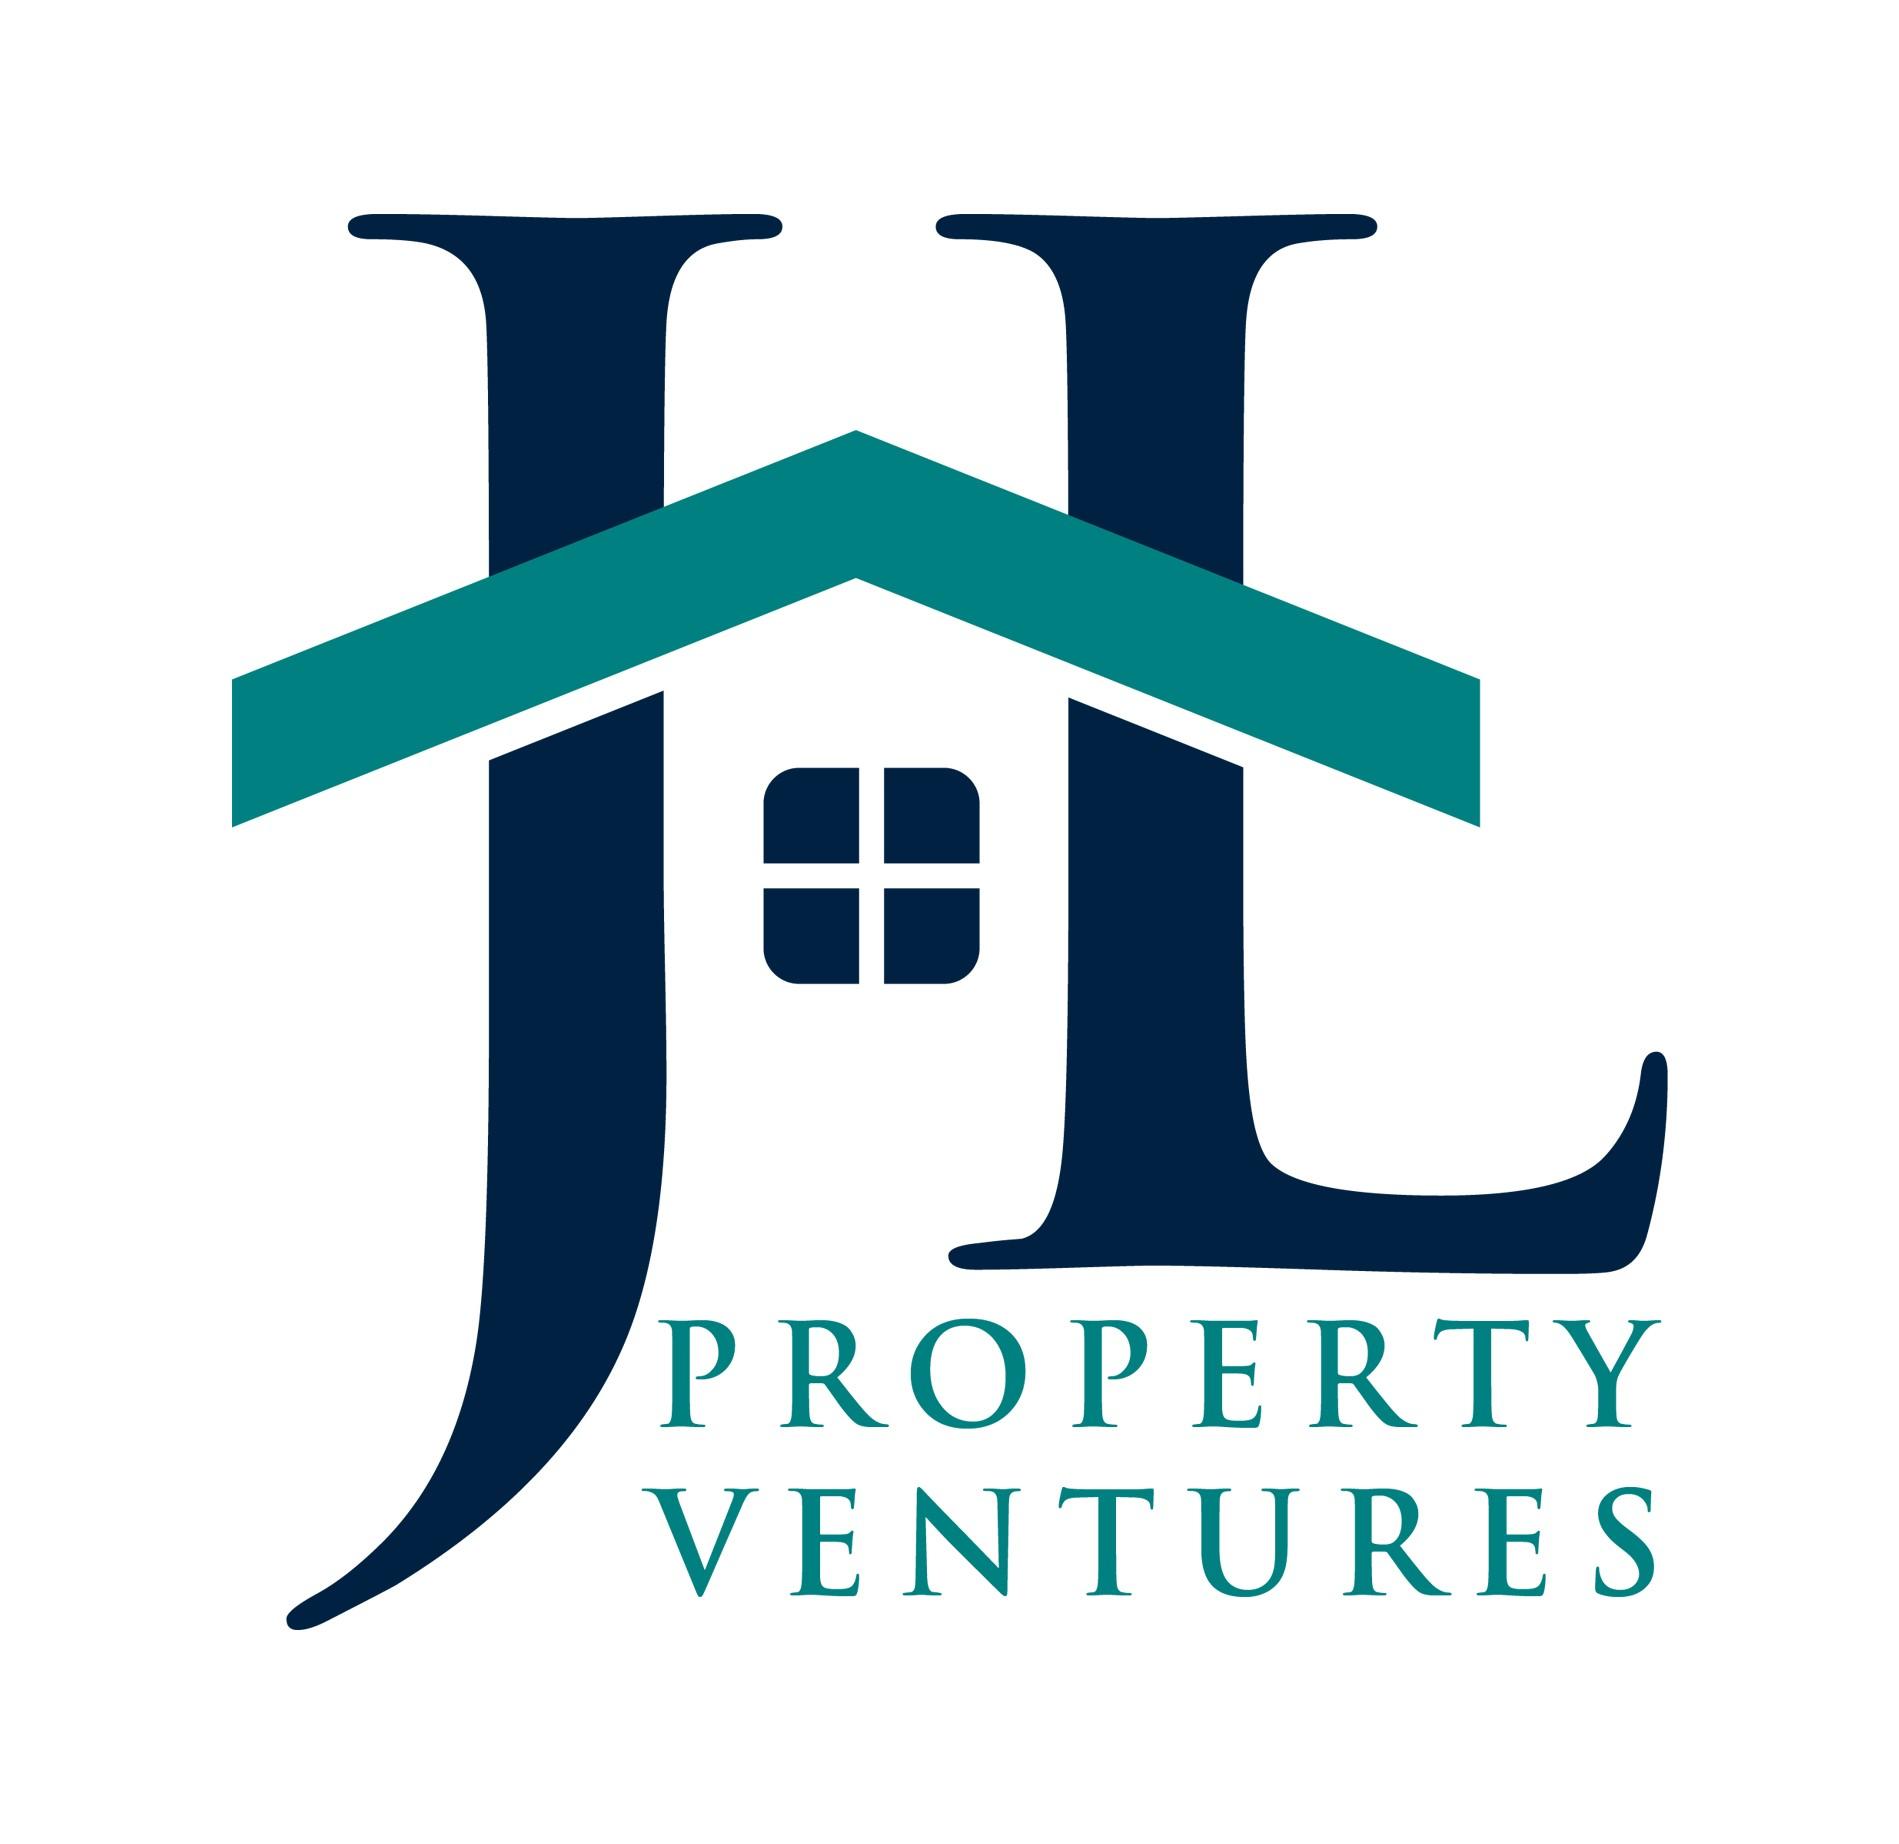 JL Property Ventures